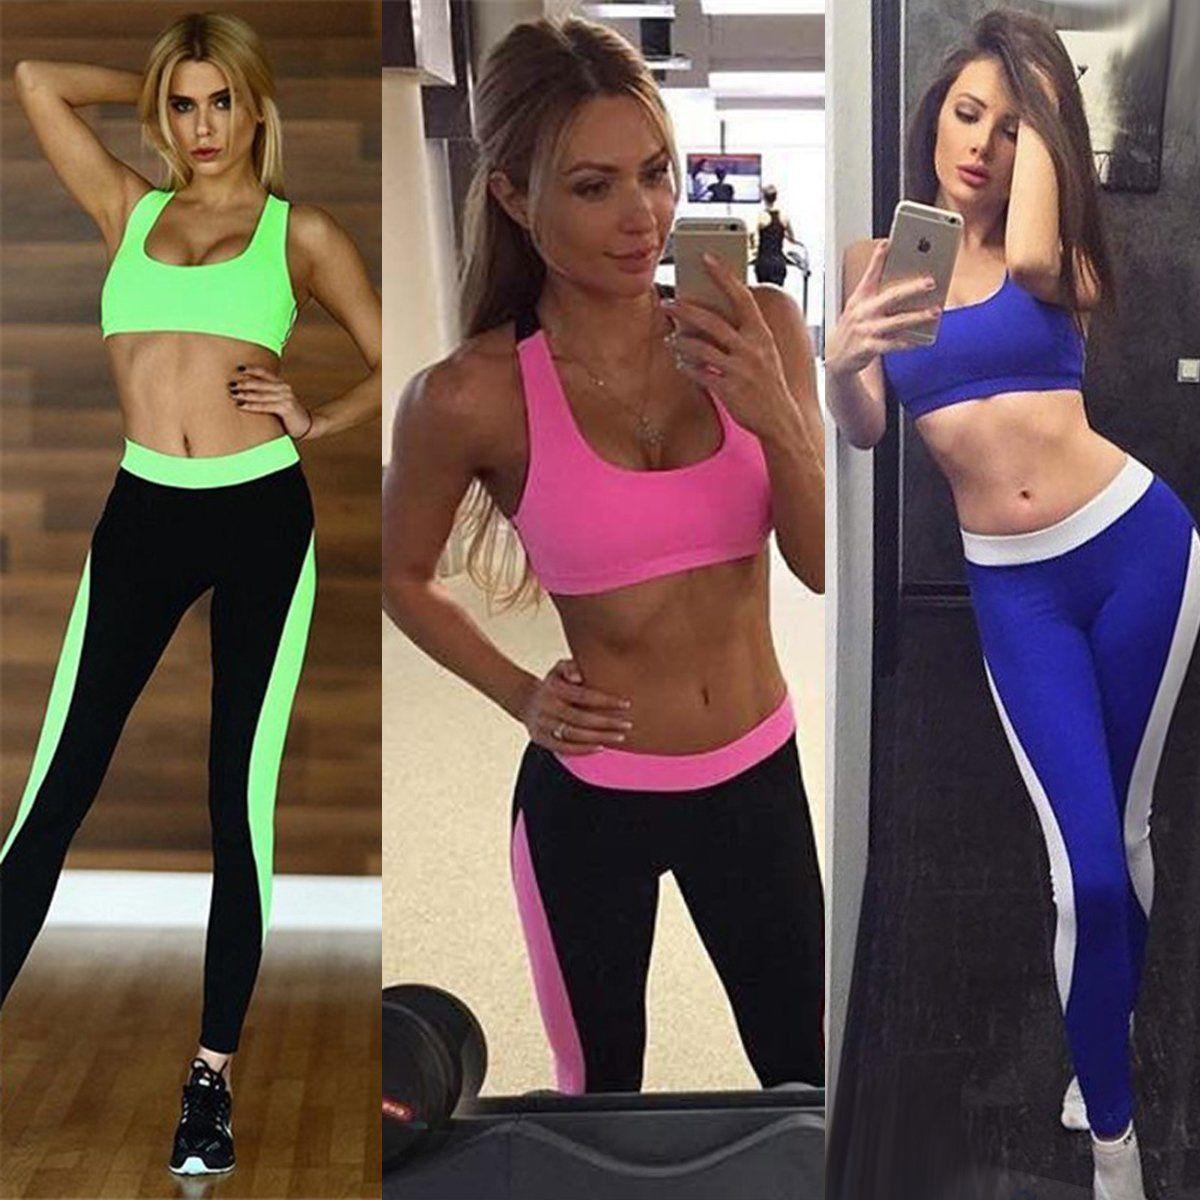 830f3158110dda Activewear Women Yoga Fitness Crop Top Vest Bra+Pants Leggings Set Gym  Workout Sports Wear Activewear Tops